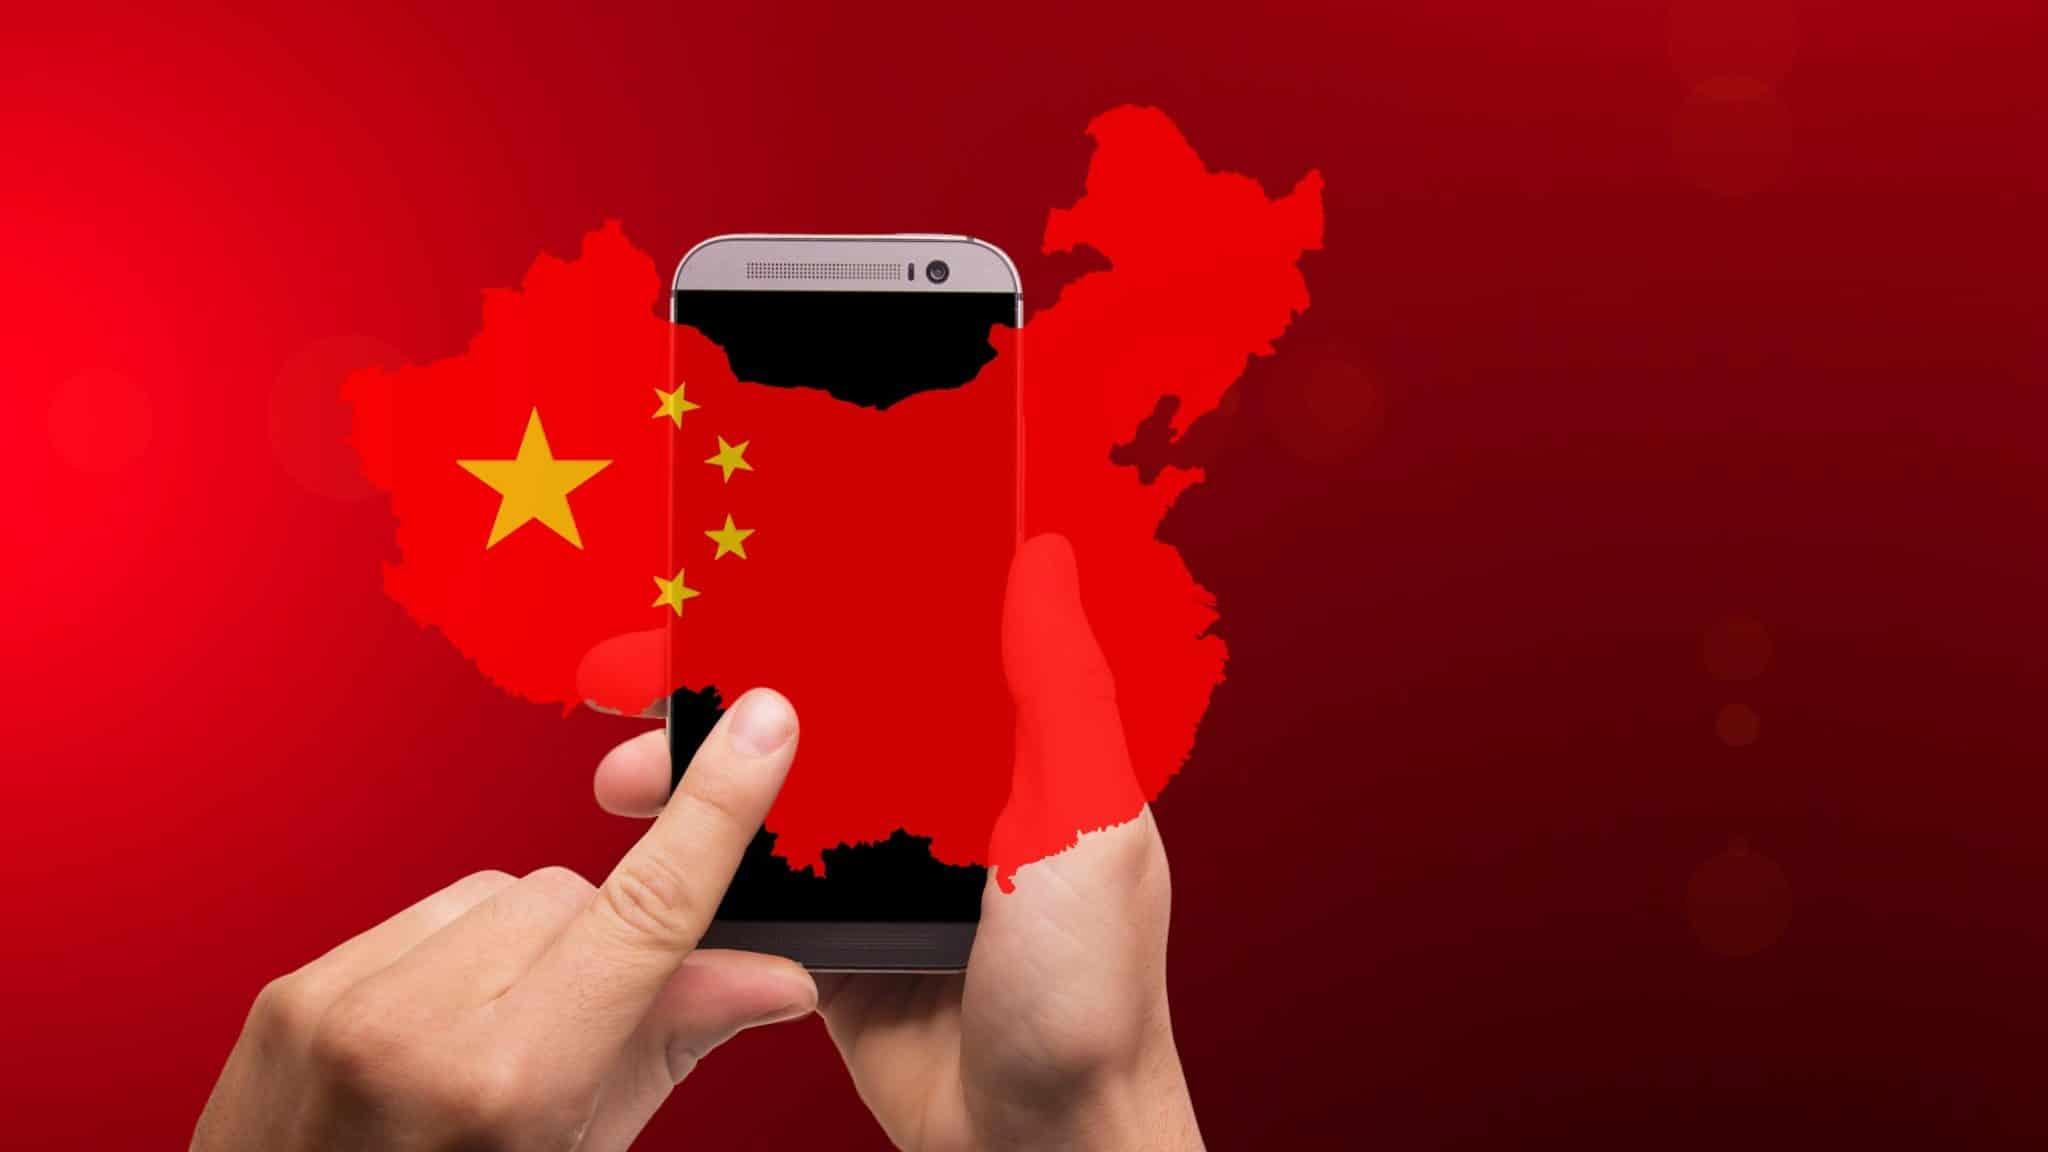 6G Mobilhalozat Kina Scaled